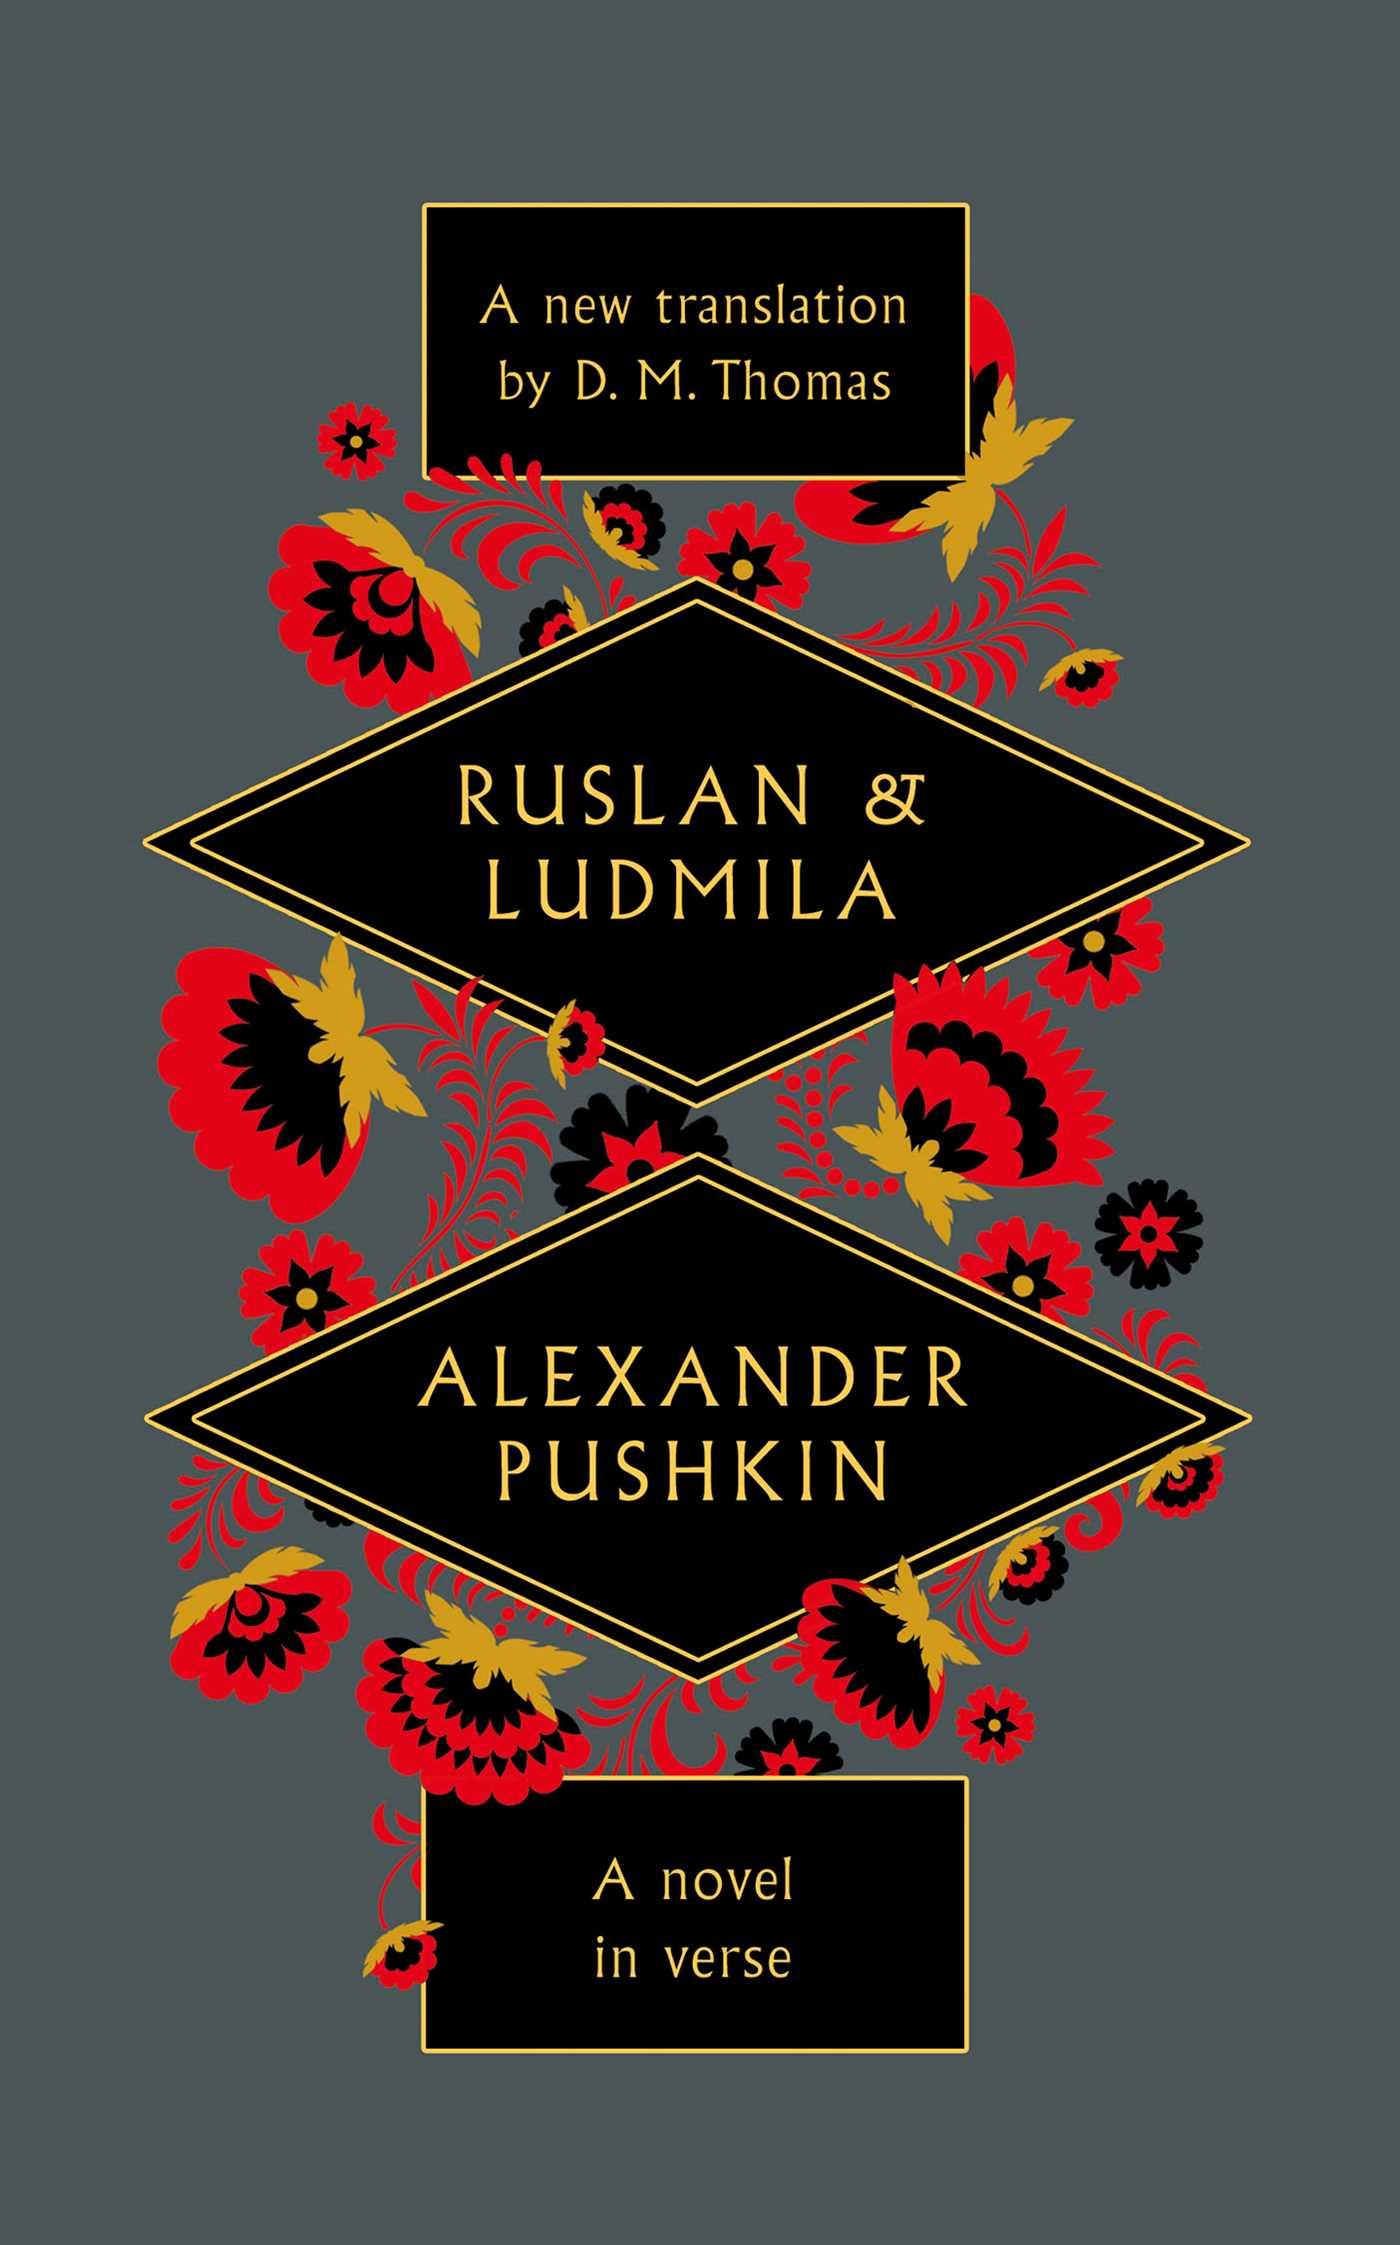 Ruslan and ludmila 9781471177460 hr